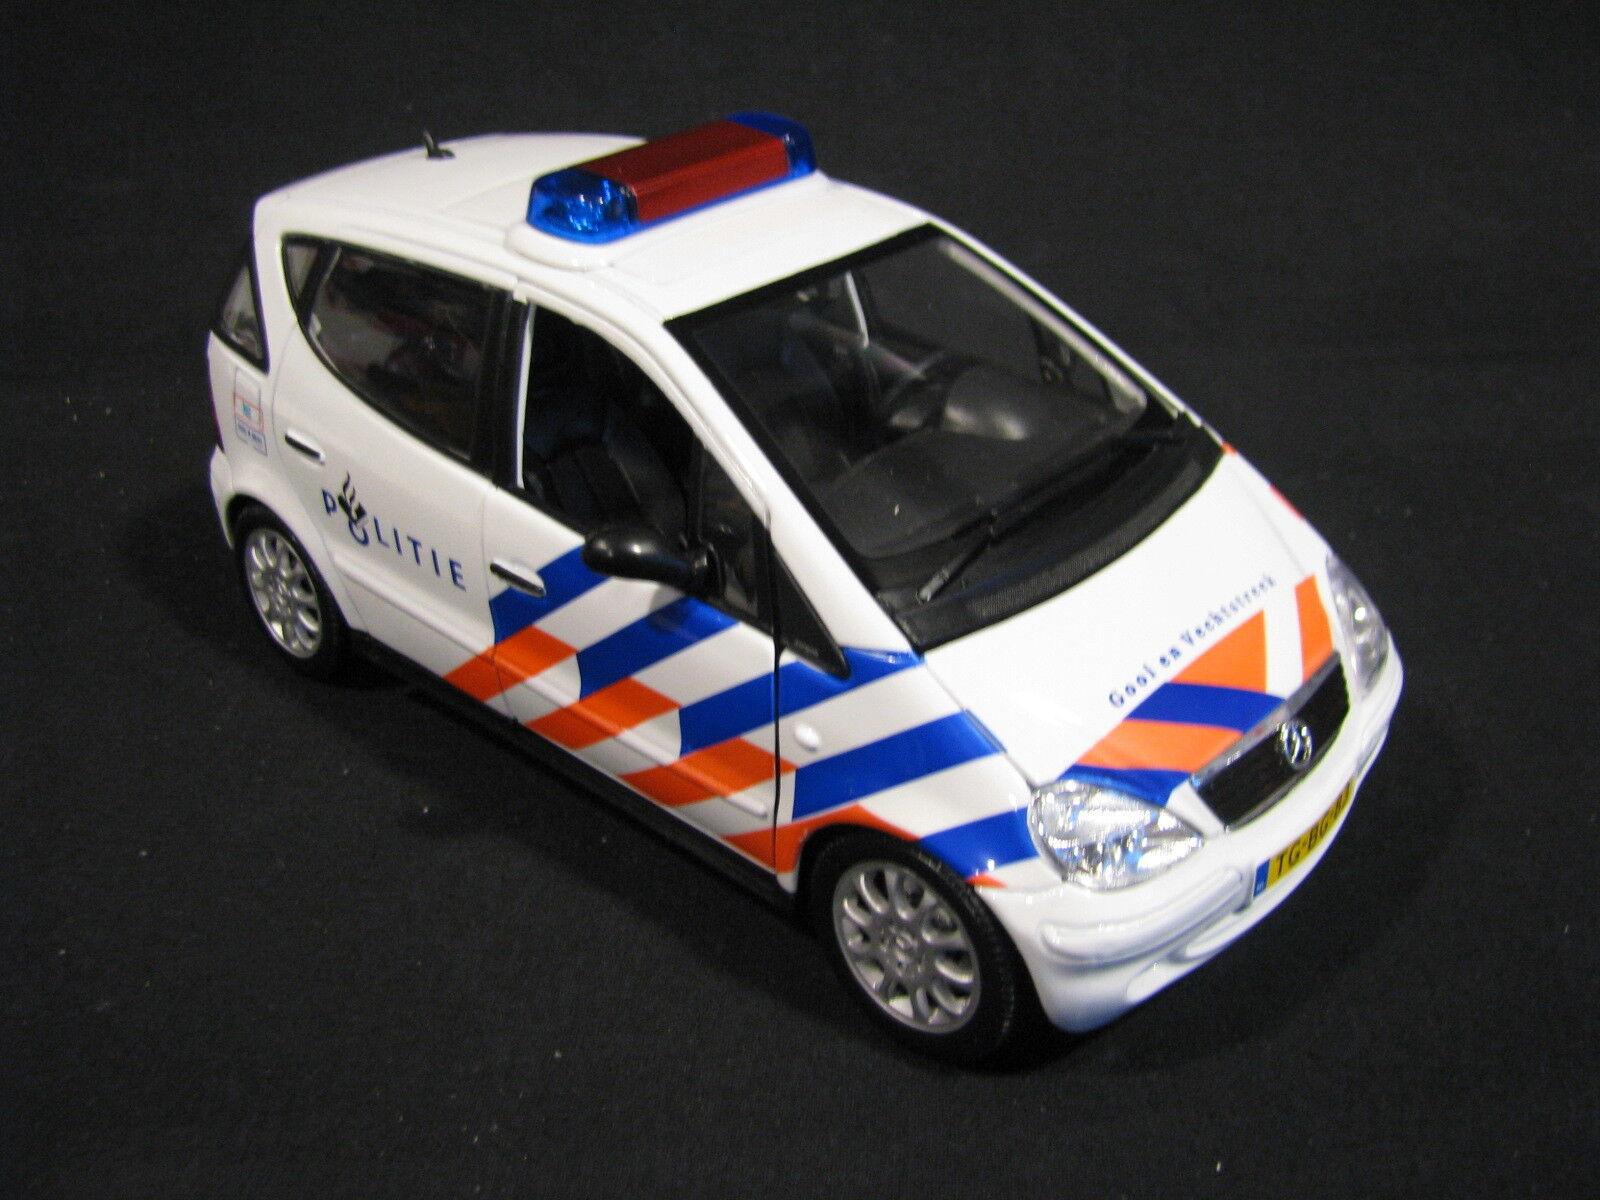 Maisto Mercedes-Benz A-Klasse 1 18 Politie Gooi en Vechtstreek (NED) (JvM)